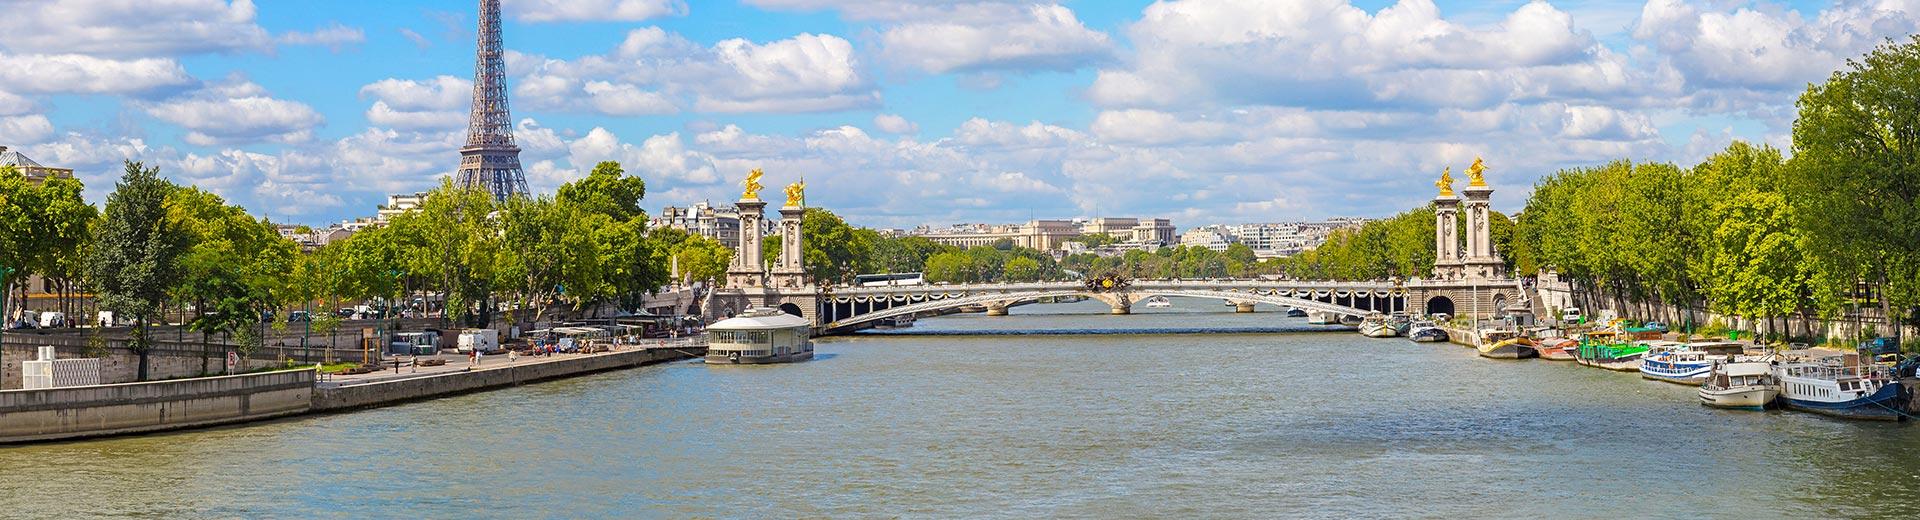 Gruppenreise Paris - Package Gruppen Classic Bahn